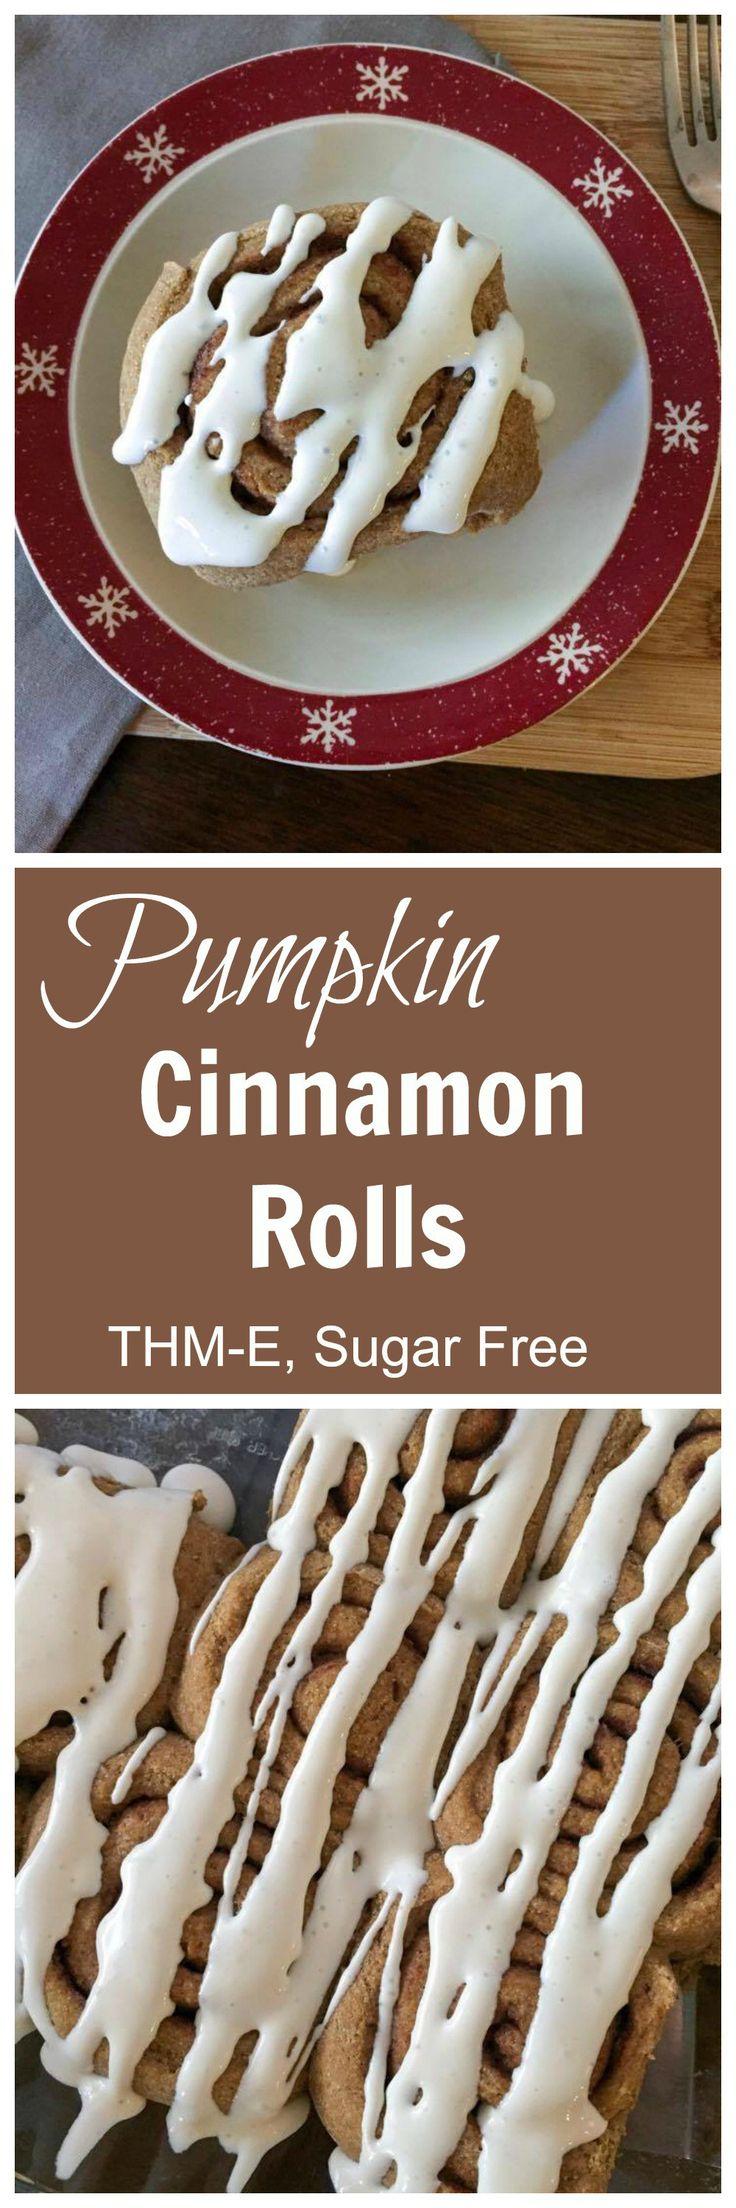 THM-Friendly Pumpkin Cinnamon Rolls (THM-E, Sugar Free)